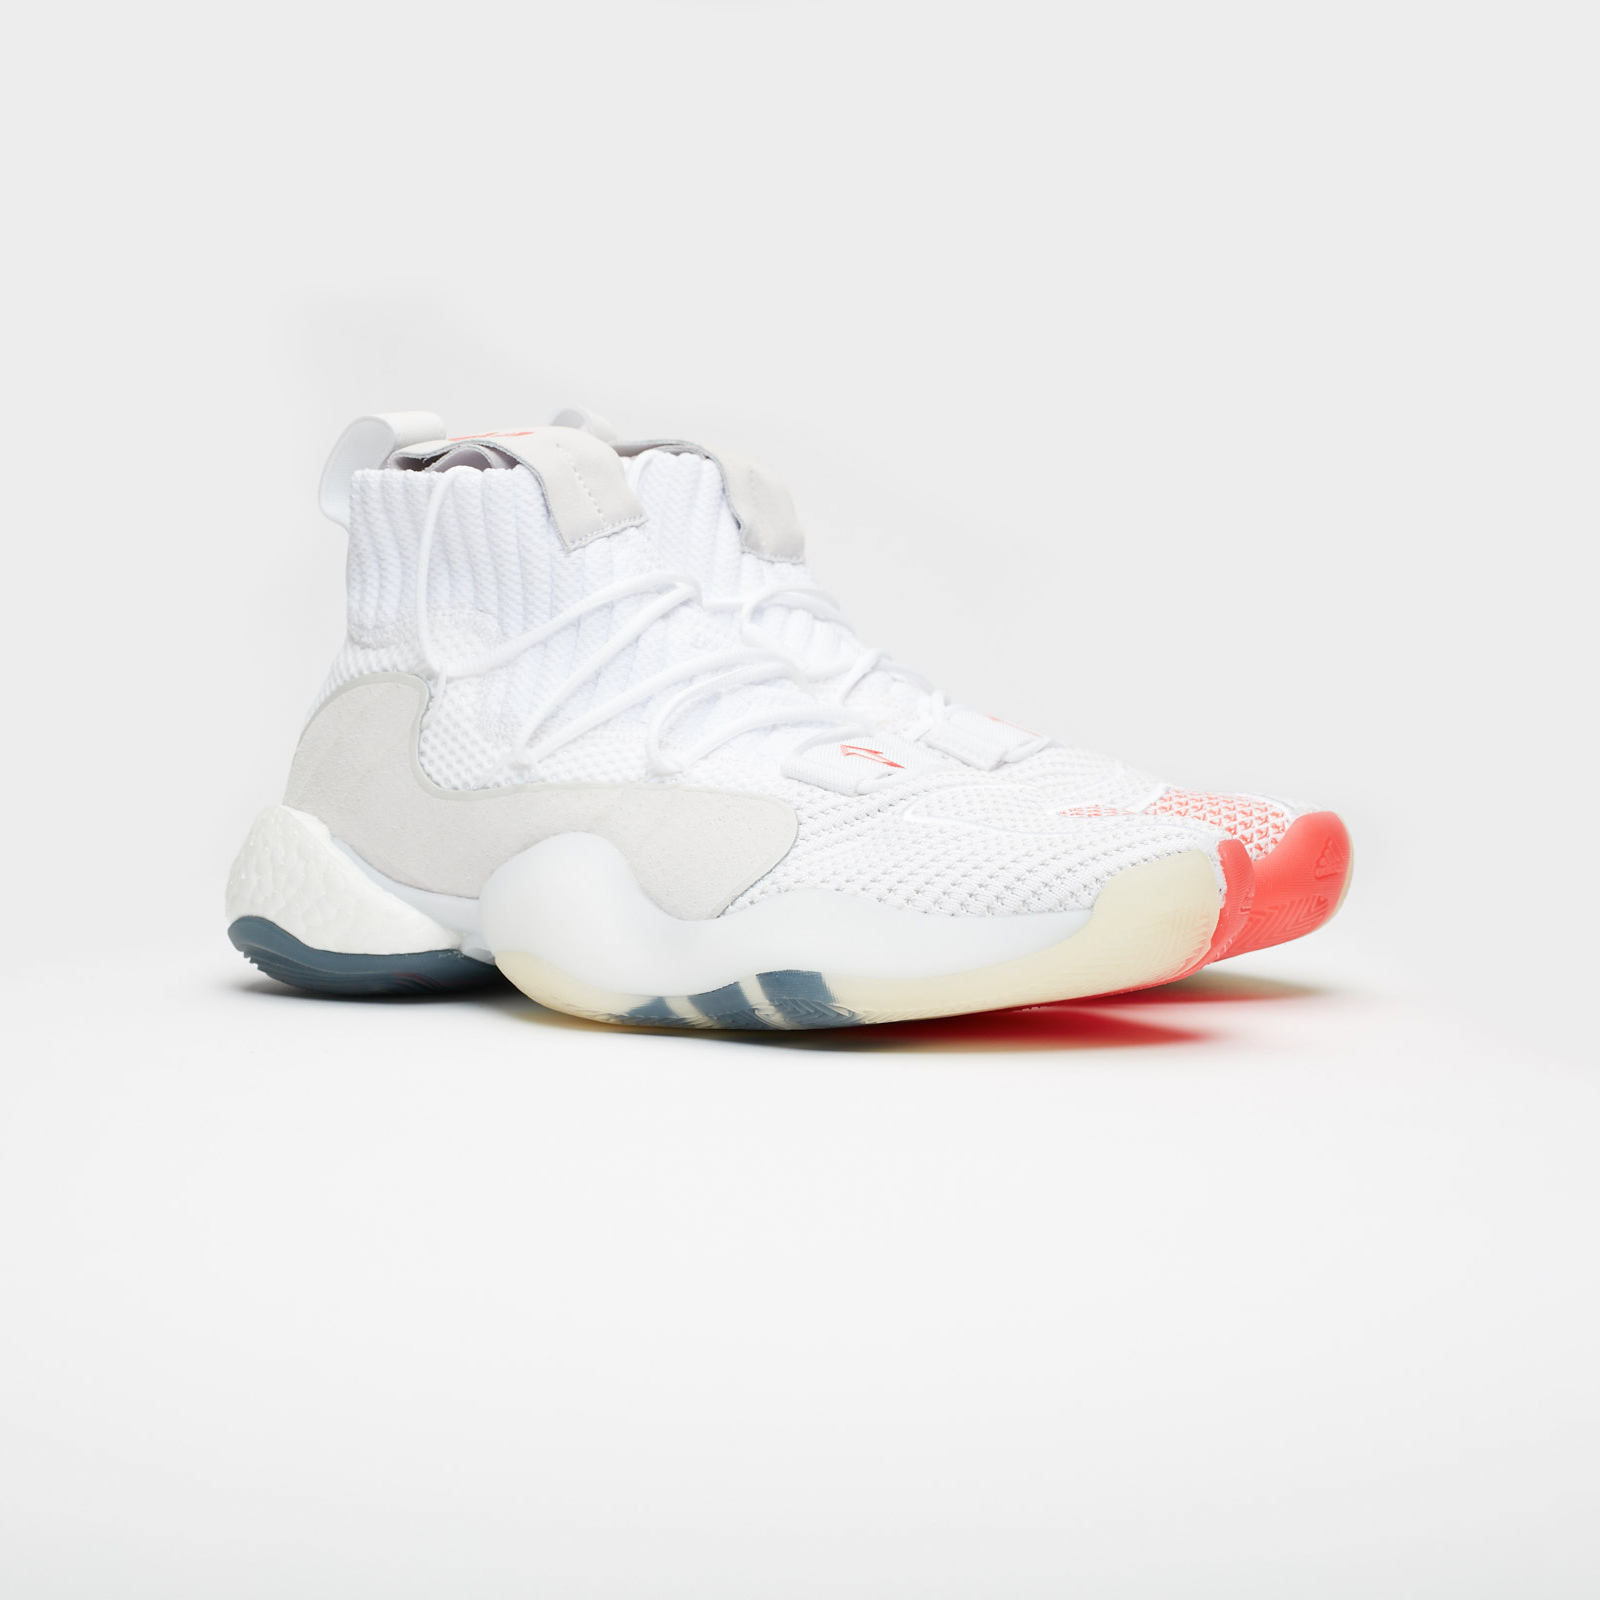 80899fc54956 adidas Crazy BYW Pro - B42246 - Sneakersnstuff